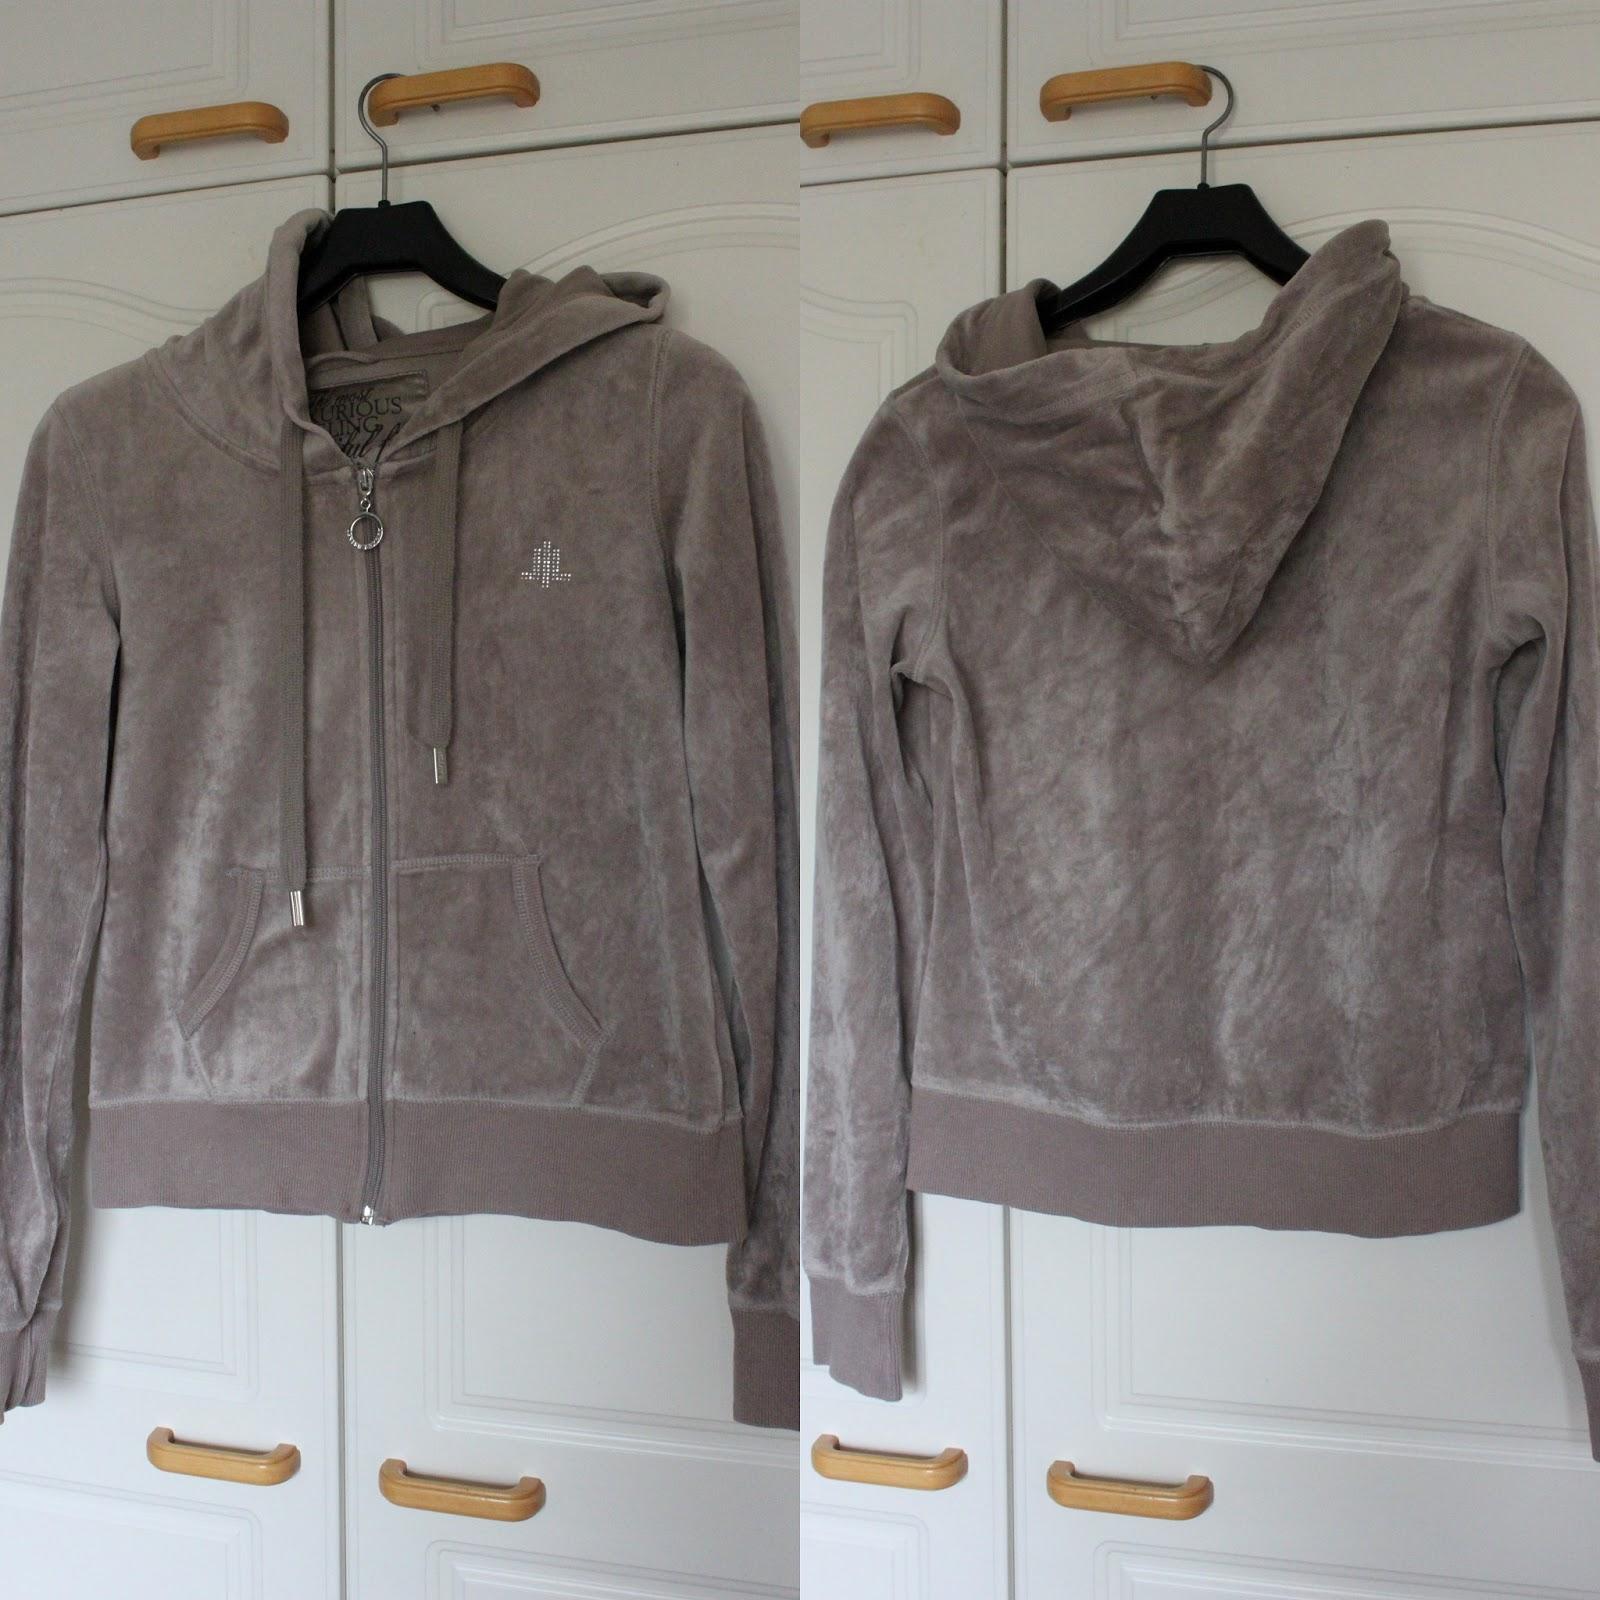 blogikirppis  Ensimmäiset vaatteet c7467b7a51